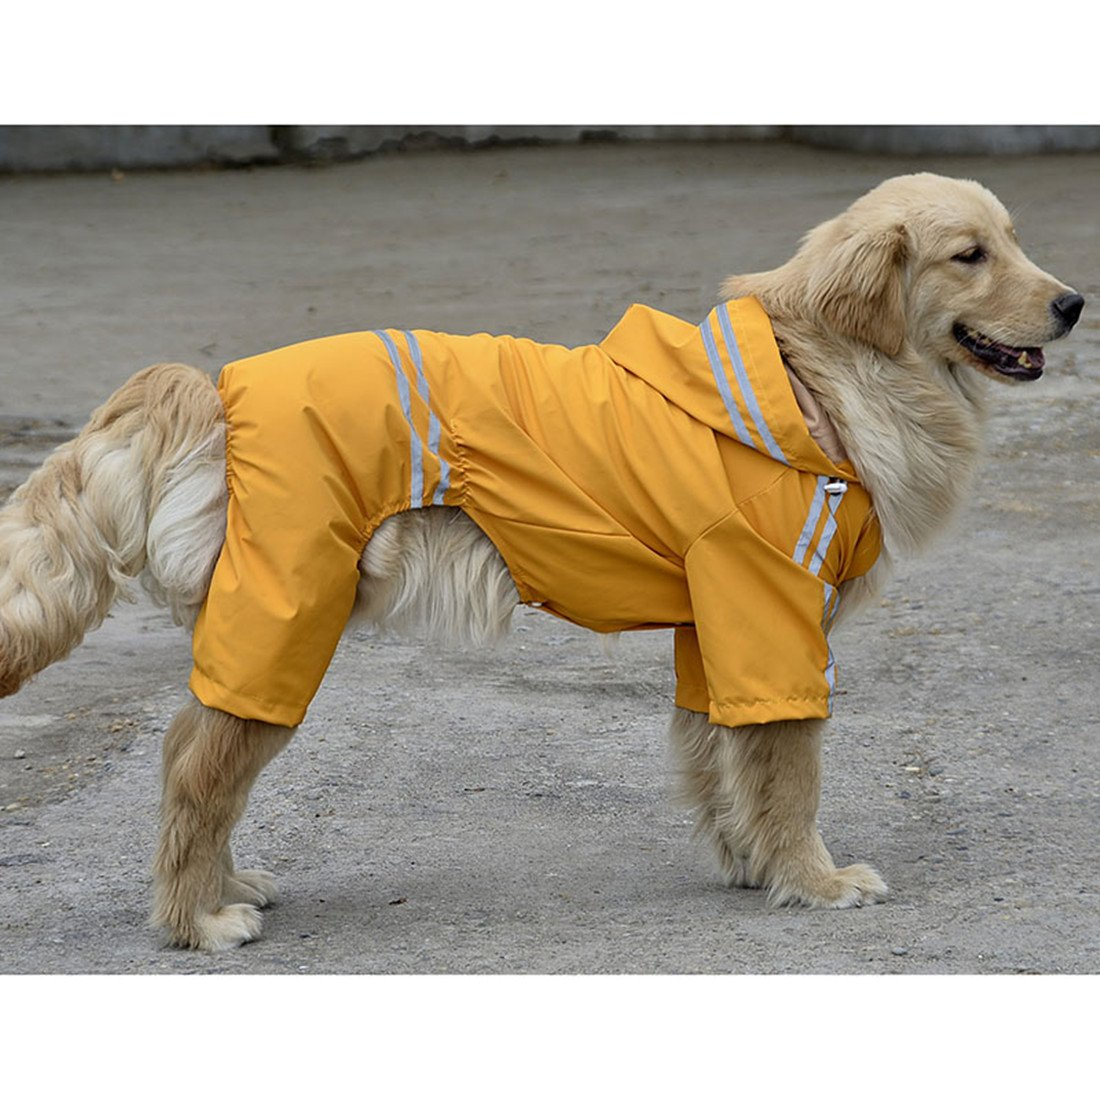 VICTORIE Pet Impermeable Poncho Rain Cover Jacket Rainwear Clothes Reflective Ligero Impermeable para Large Medium Small Dog Rojo 6XL